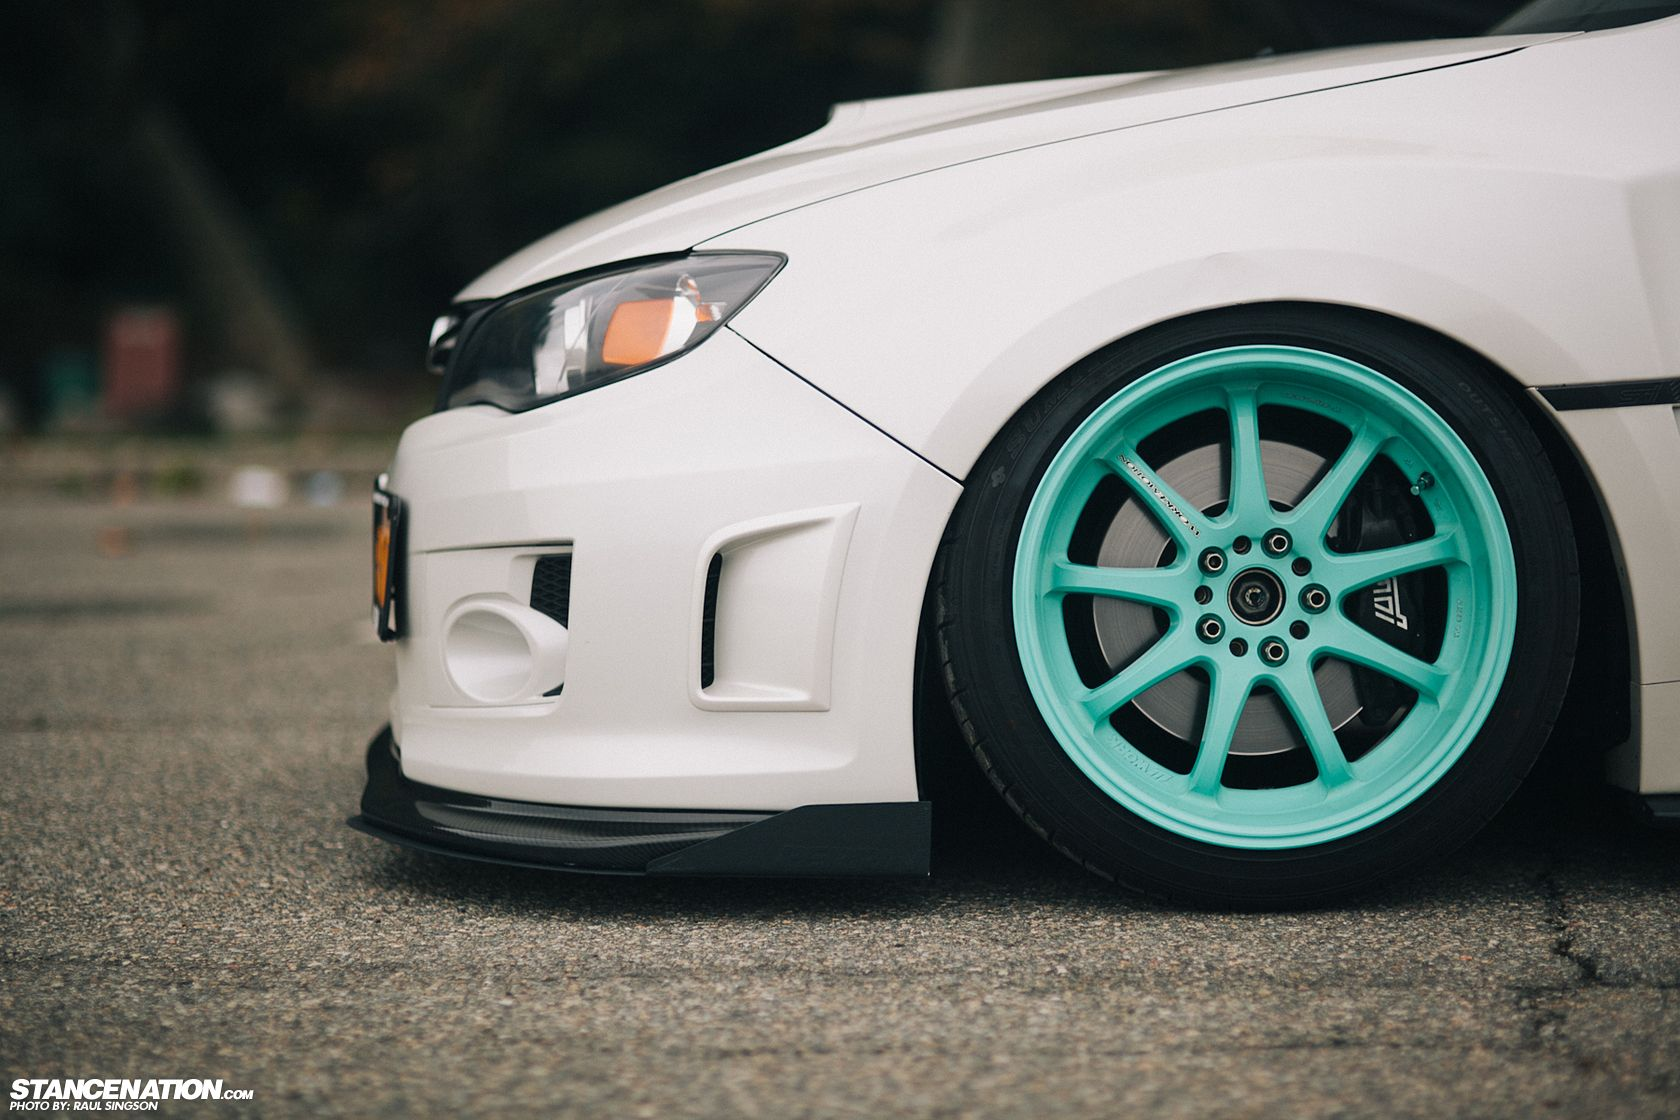 Breaking Necks On Tiffany's // Ian's sexy Subaru STi. | StanceNation™ // Form > Function